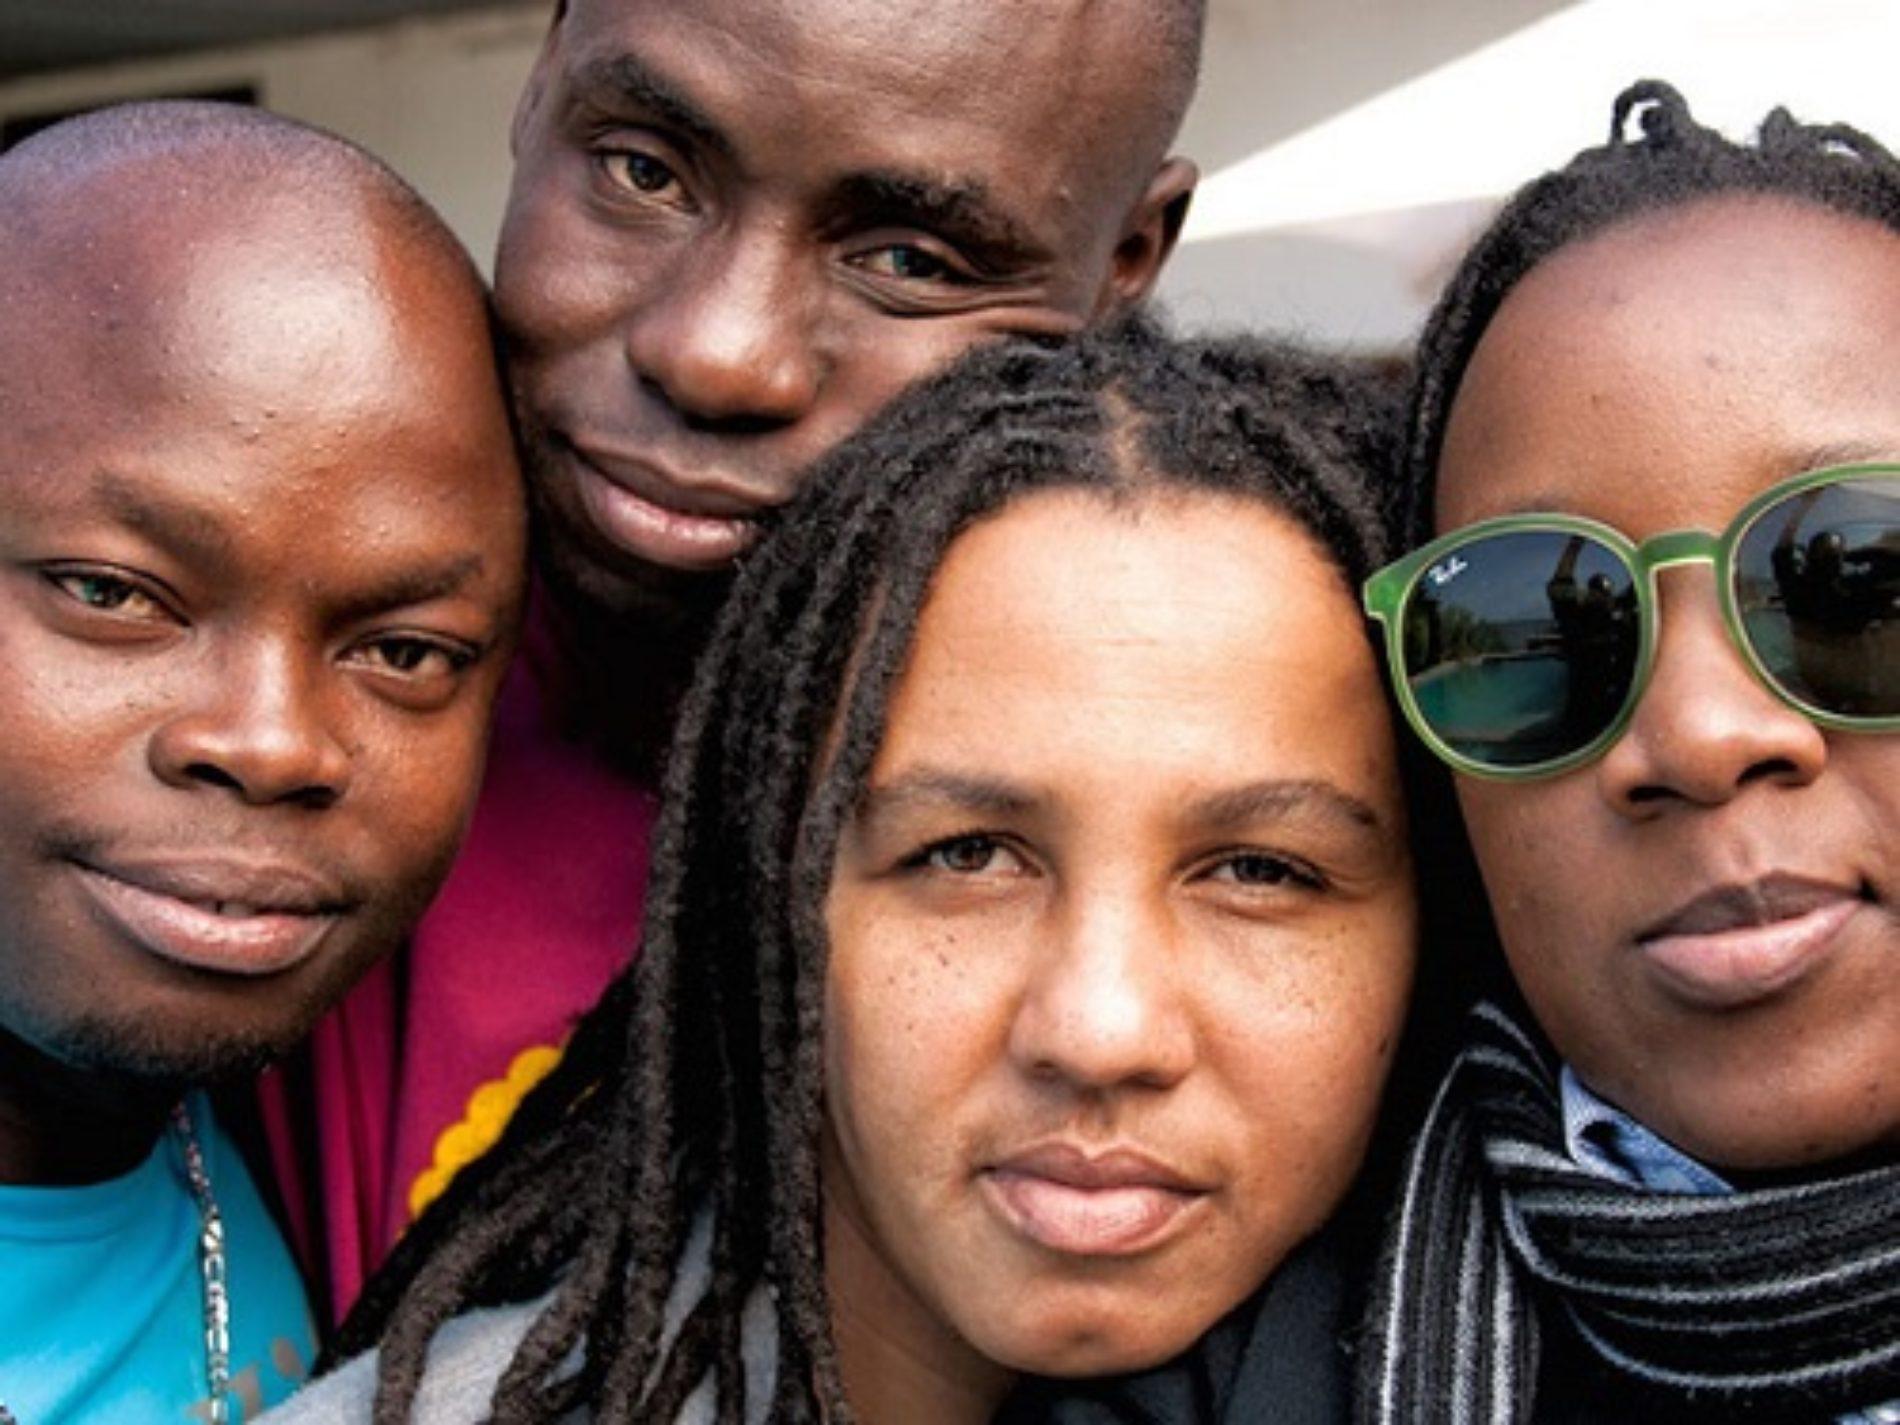 Mozambique decriminalises gay and lesbian relationships